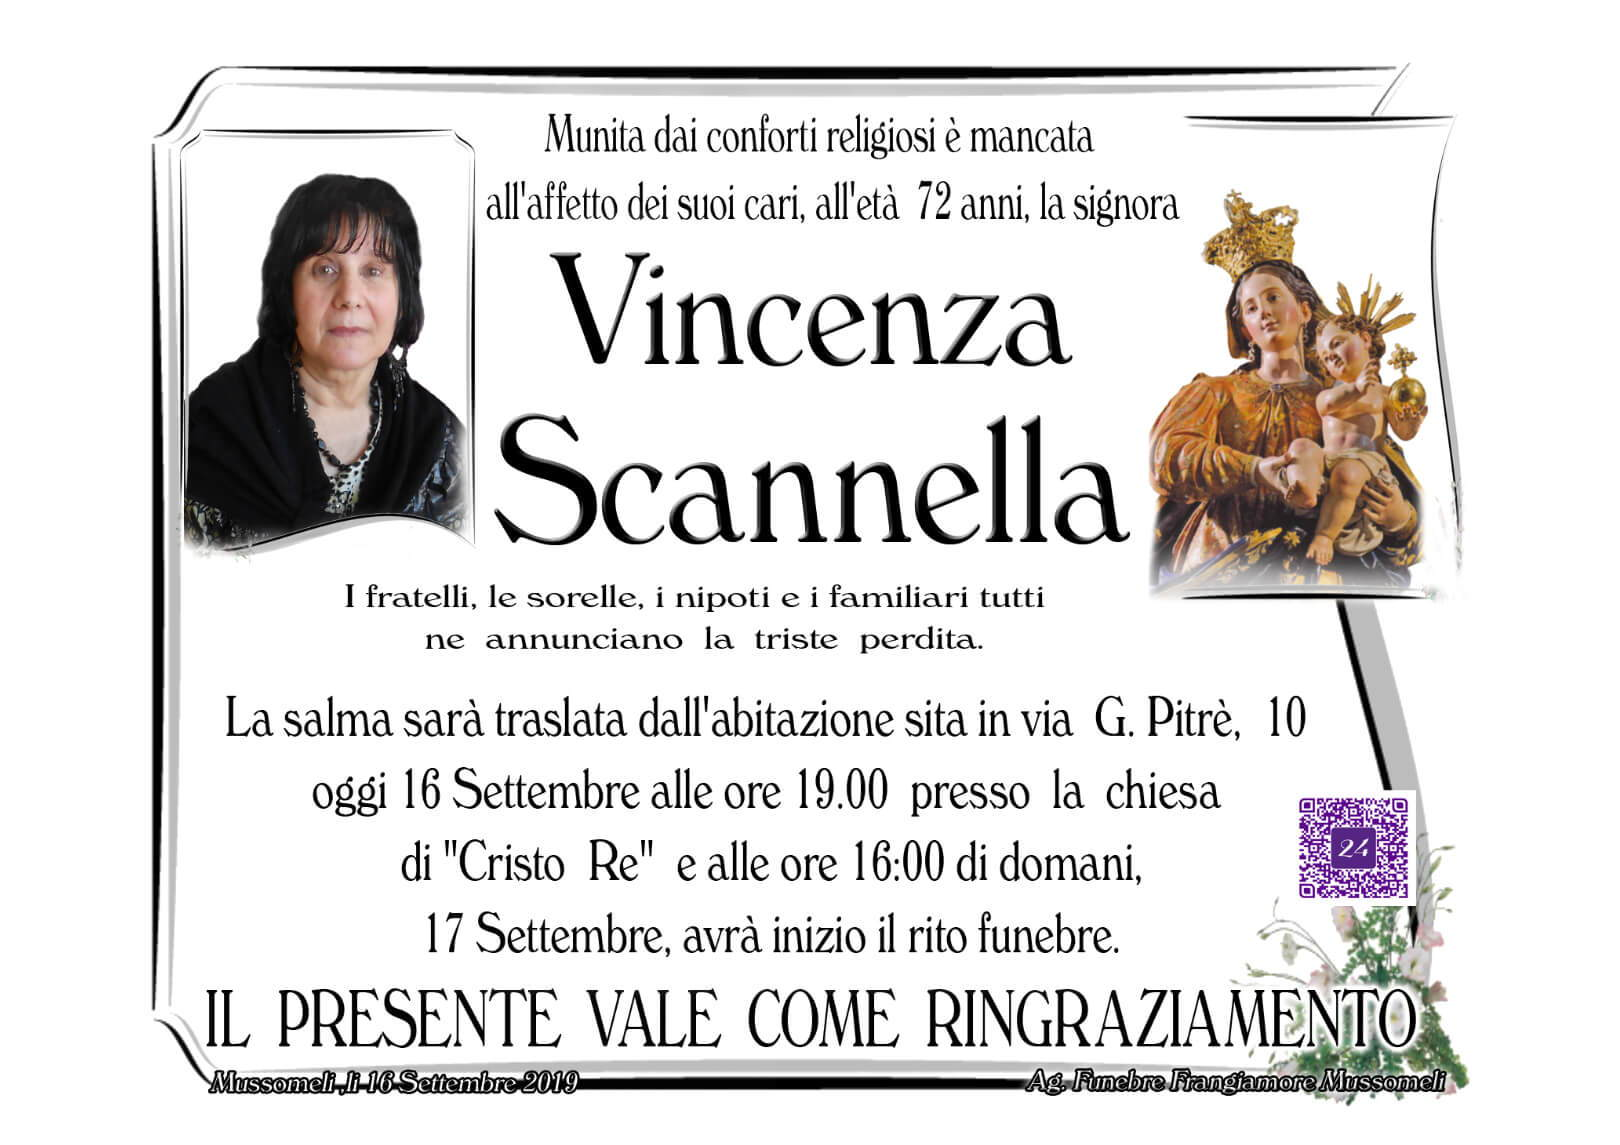 Vincenza Scannella